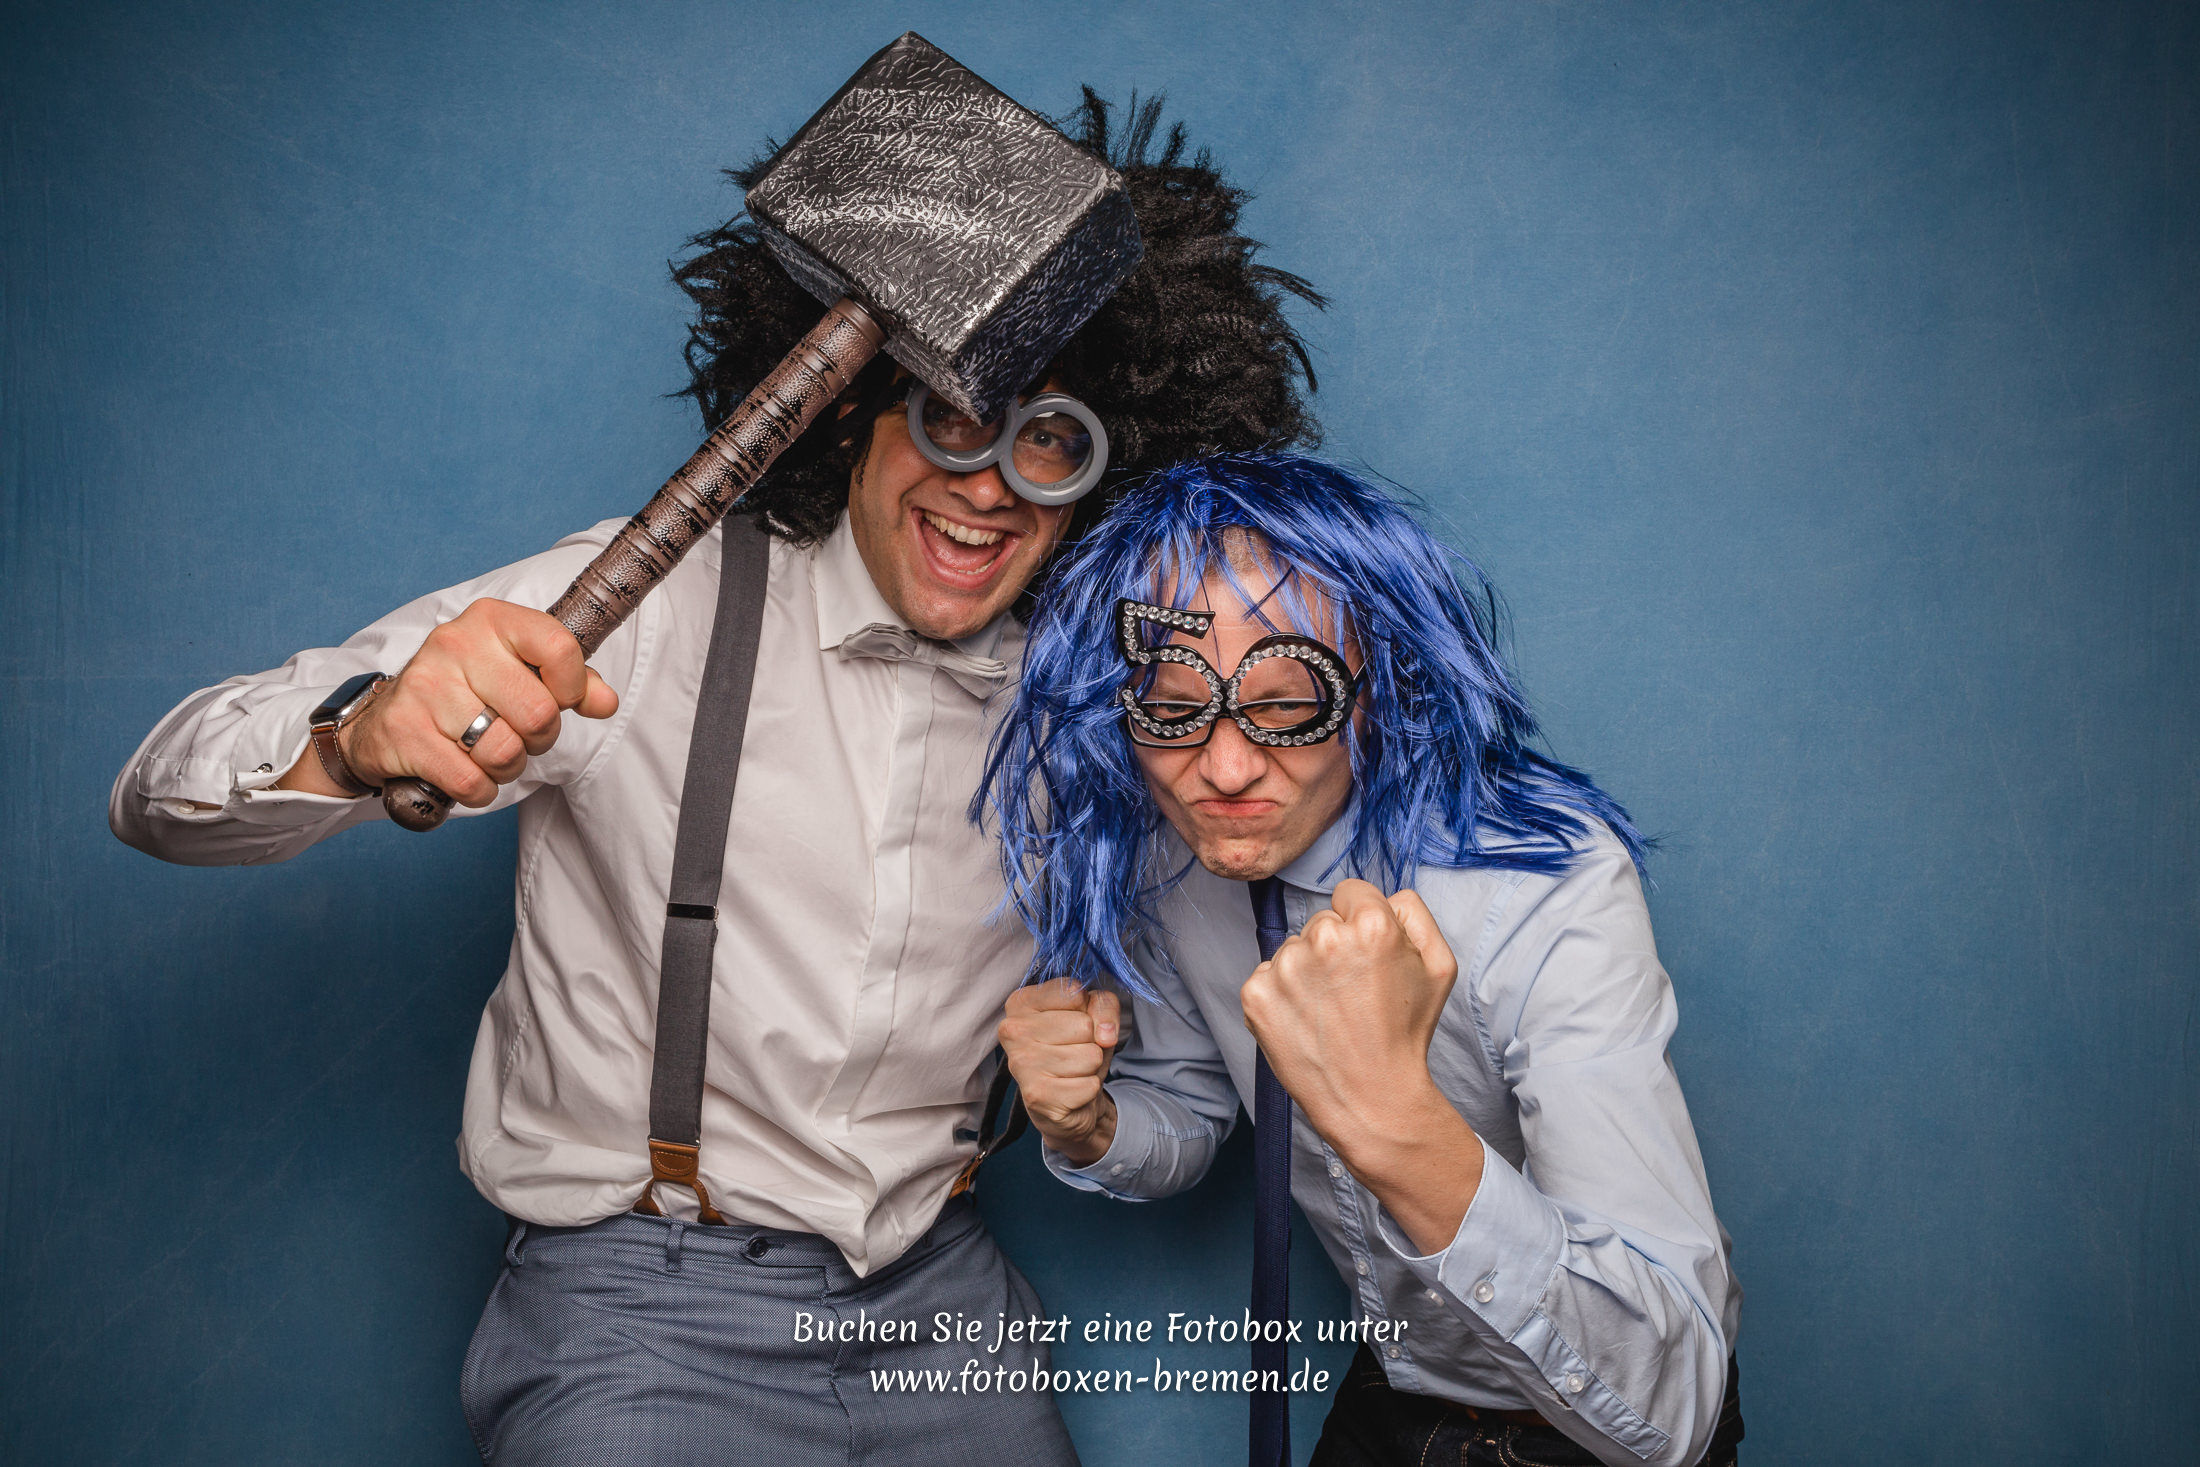 Fotobox Bremen Hochzeit mieten 008 - Fotobox Bremen mieten